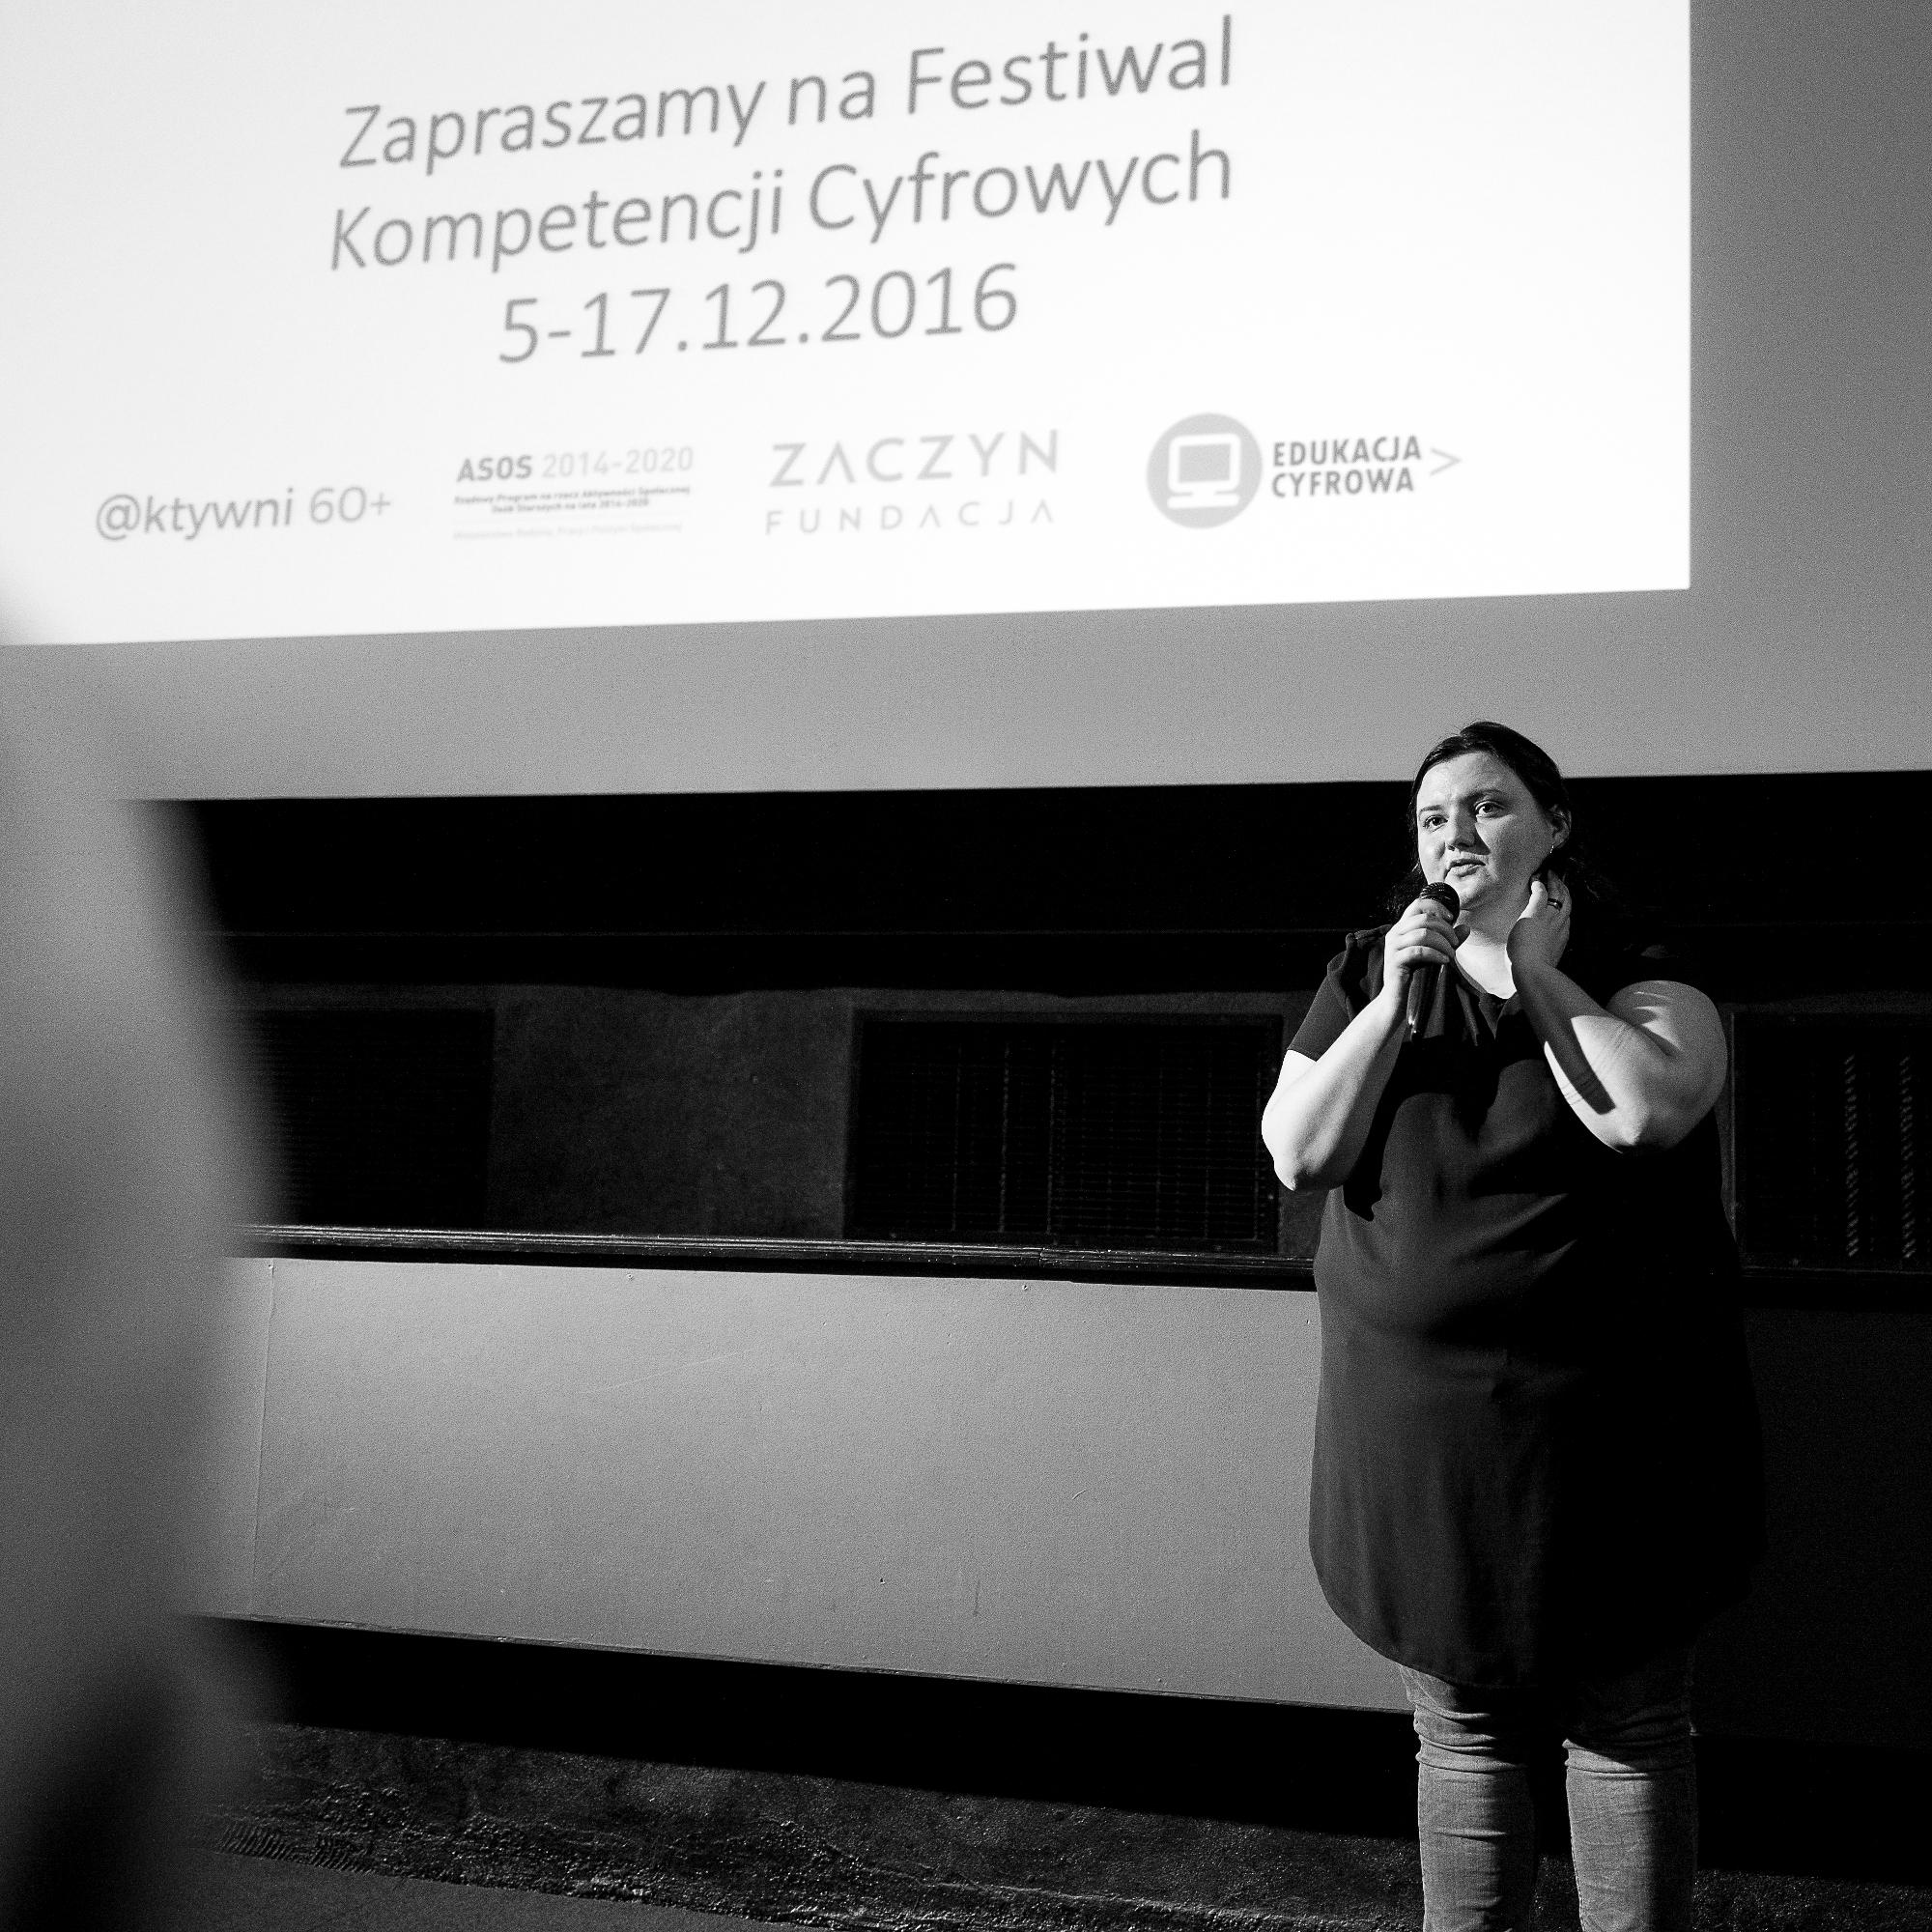 magda_zaprasza_na_festiwal